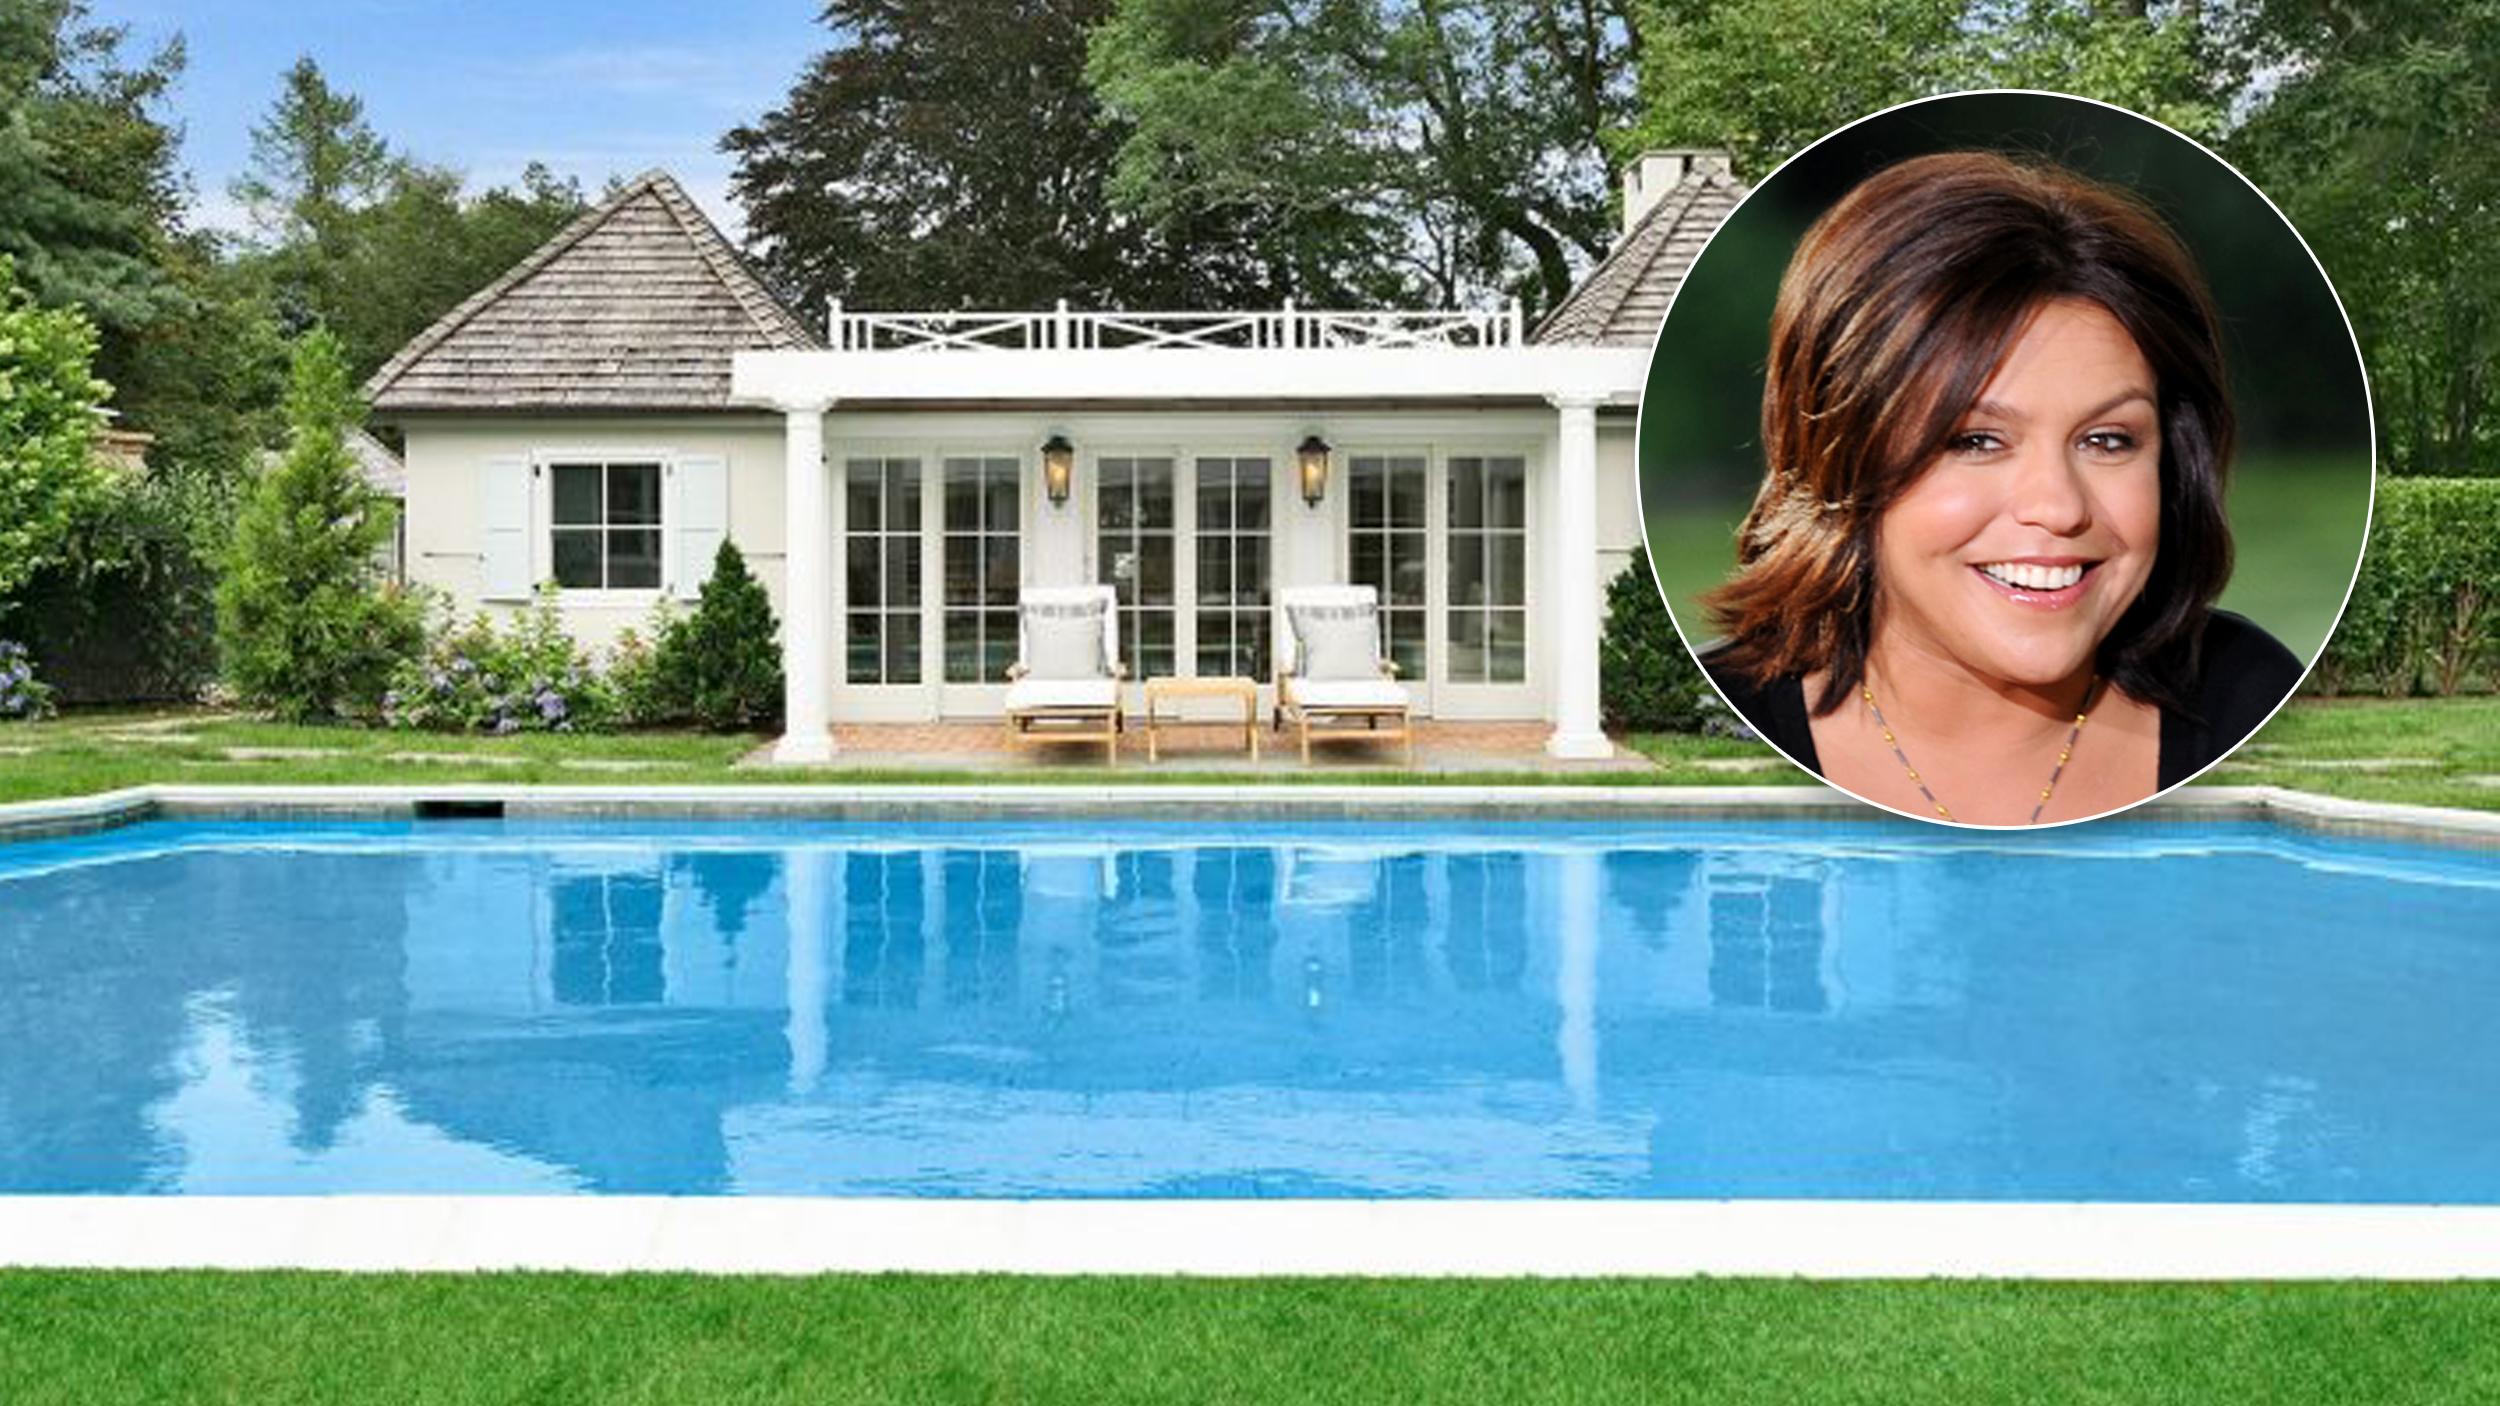 Rachael Ray Hamptons home is for sale